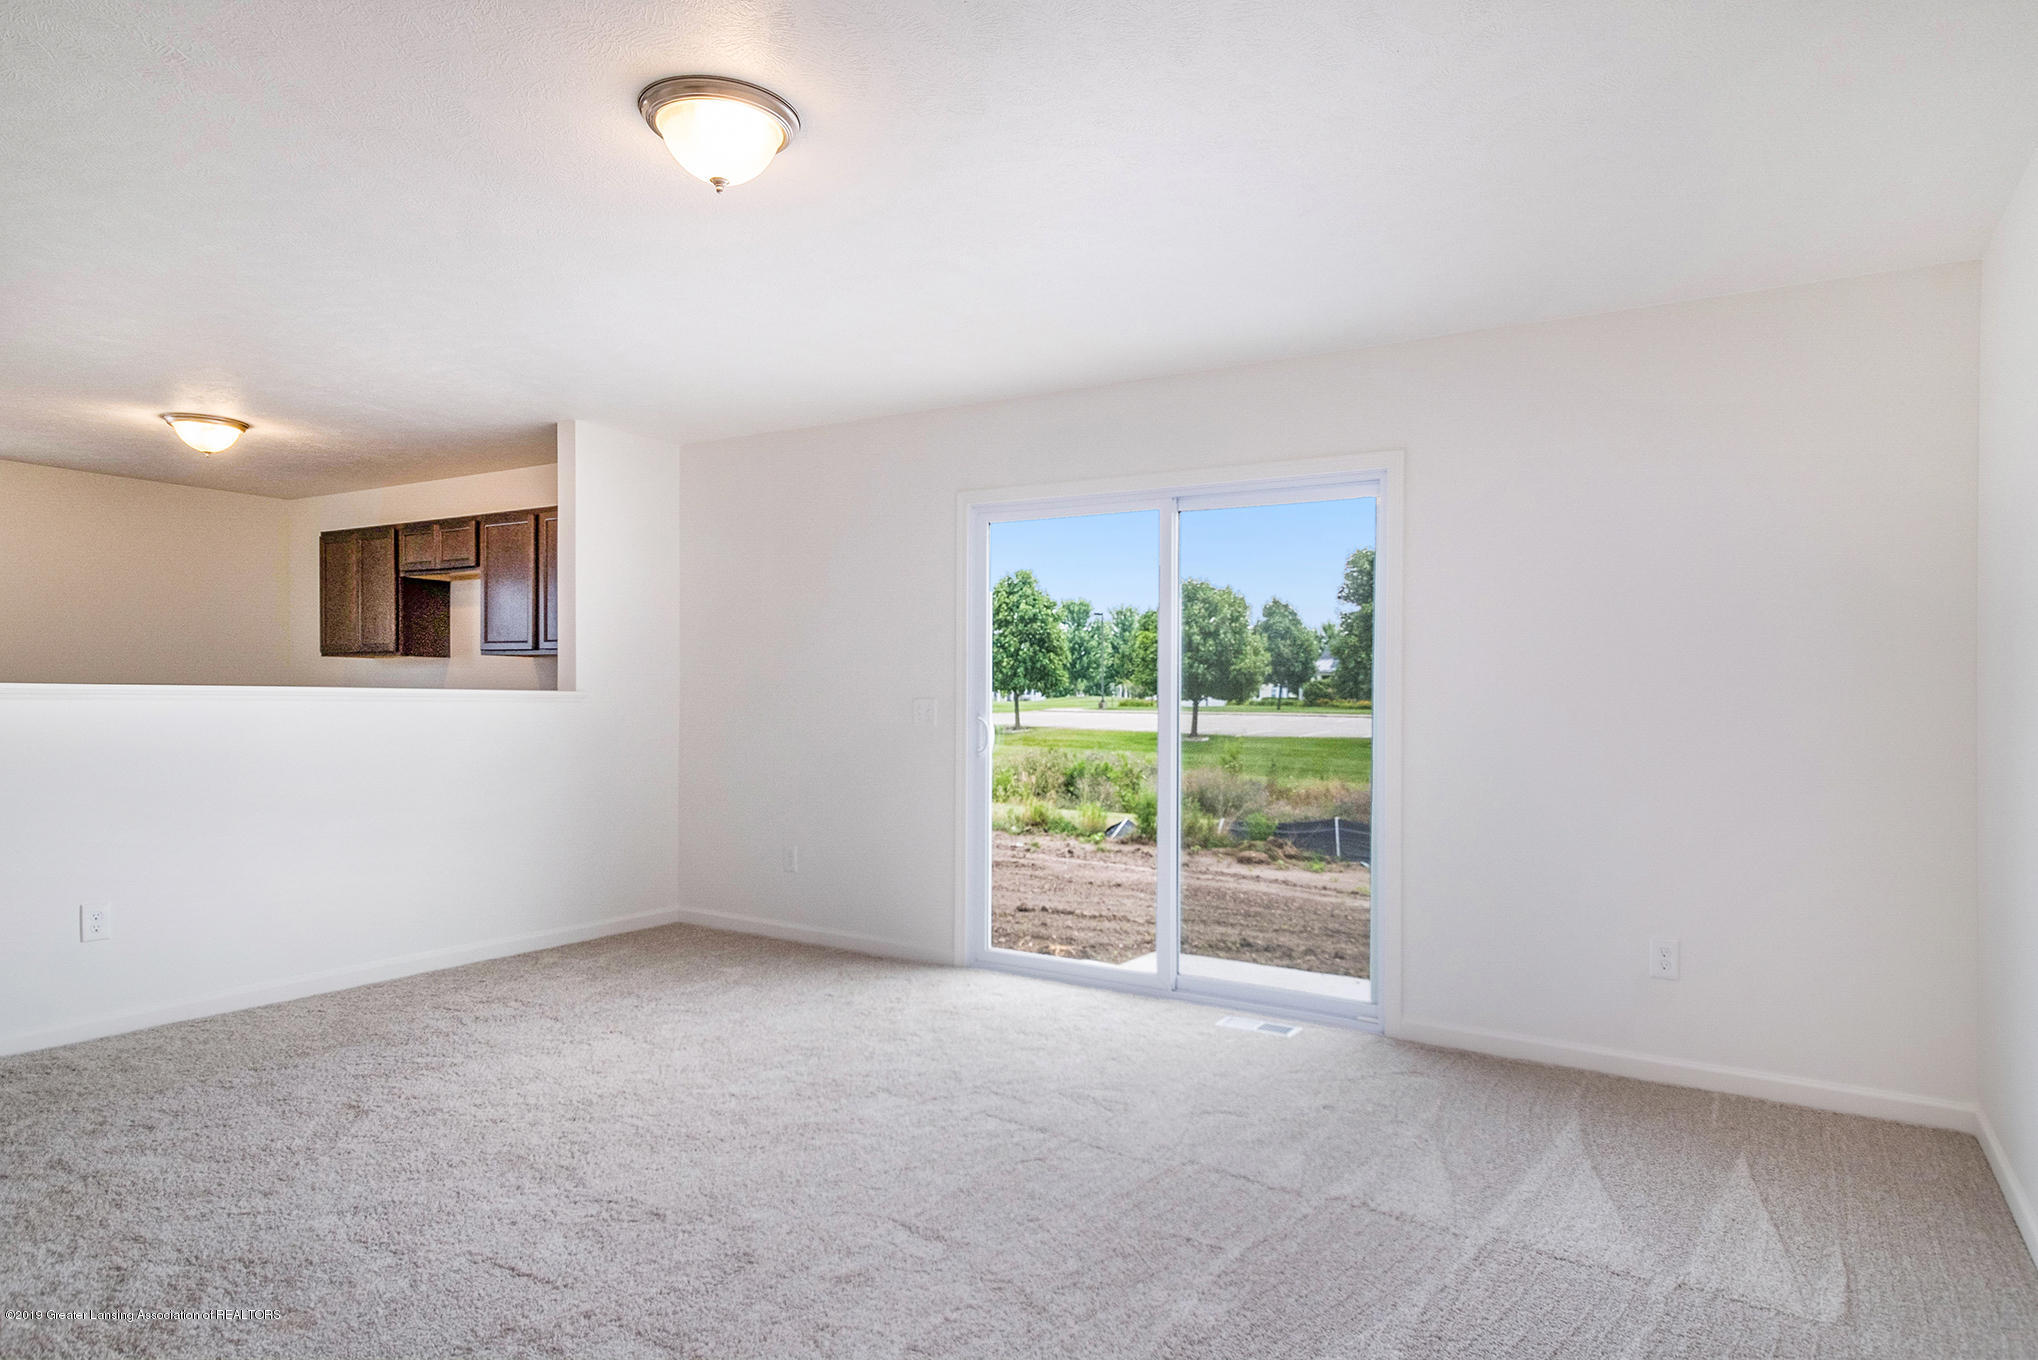 929 Bolton Farms Ln - GF2033-i1560-Great Room1 - 4